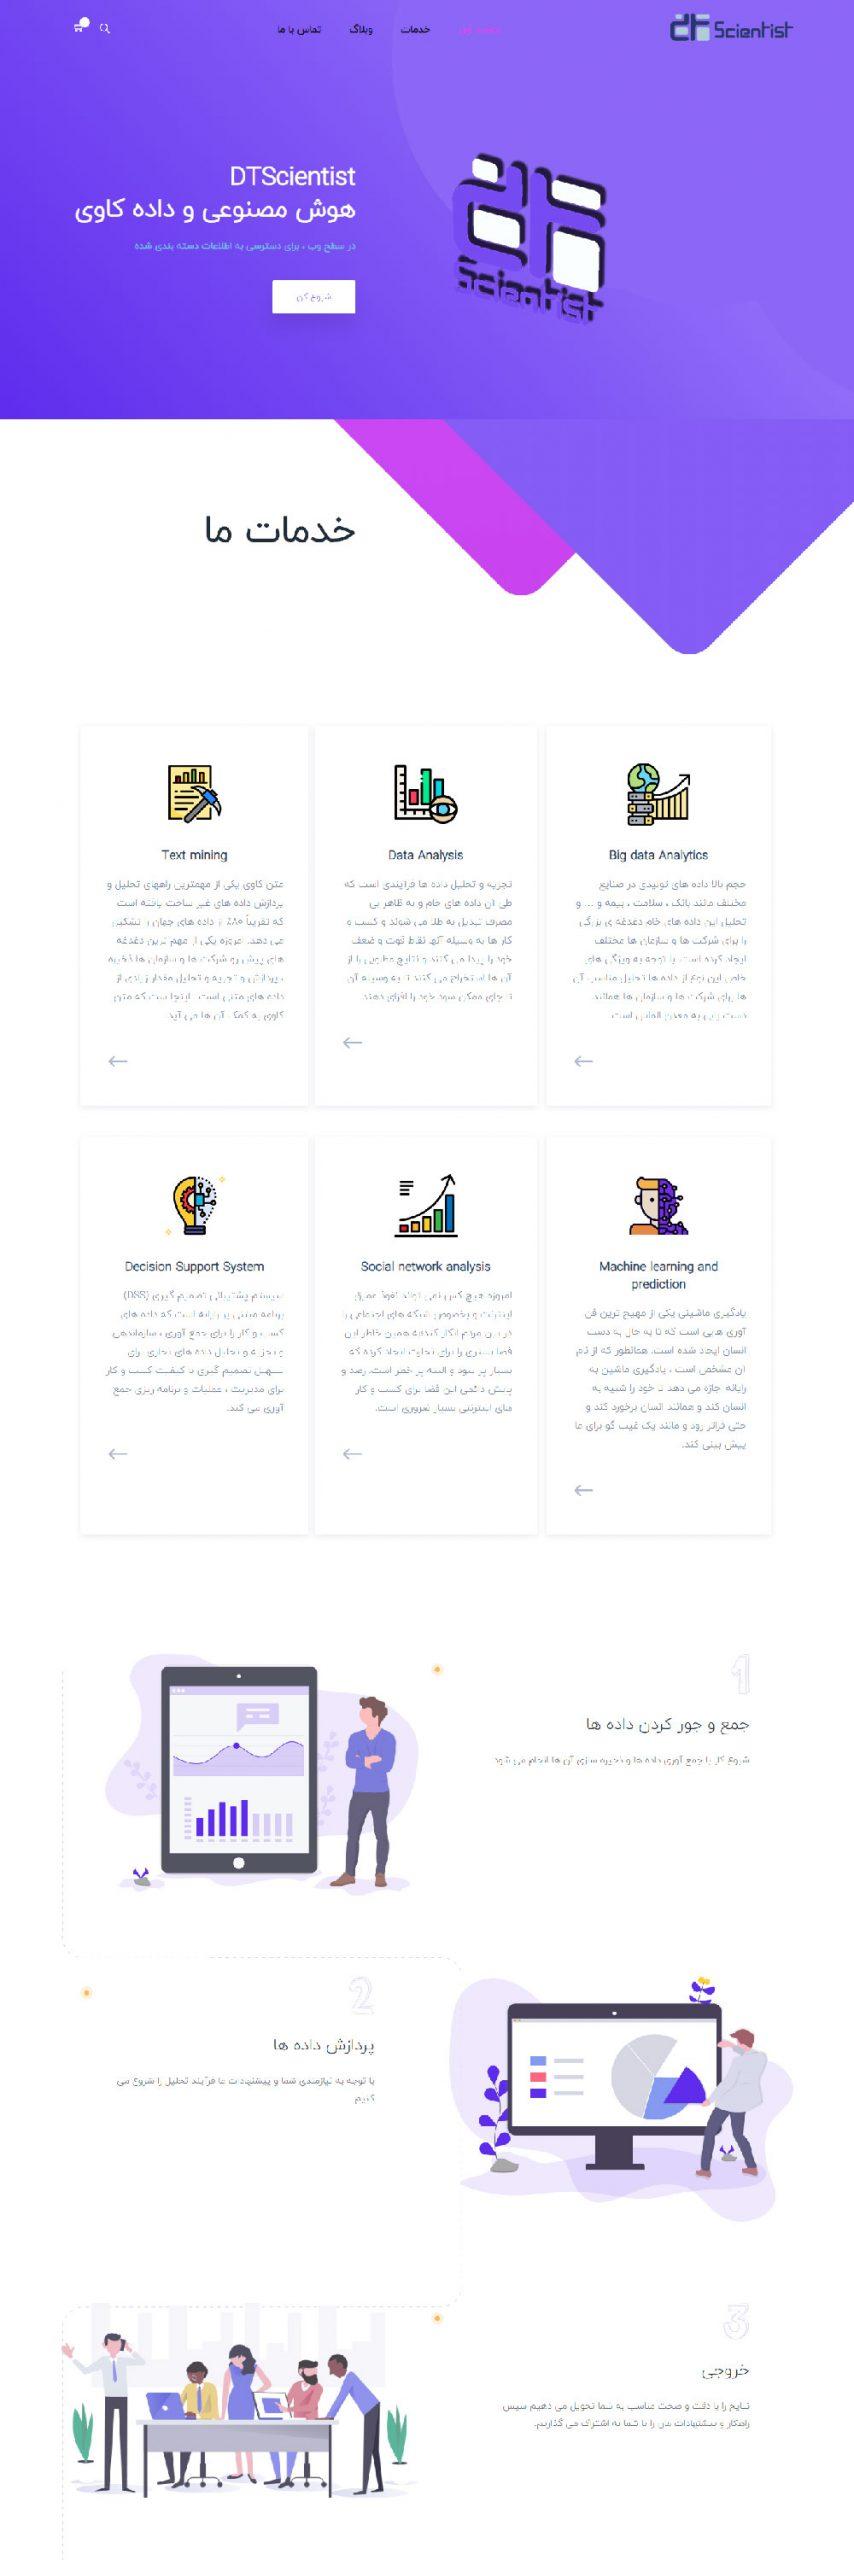 نمونه سایت خدماتی هوش مصنوعی - سپیا وب